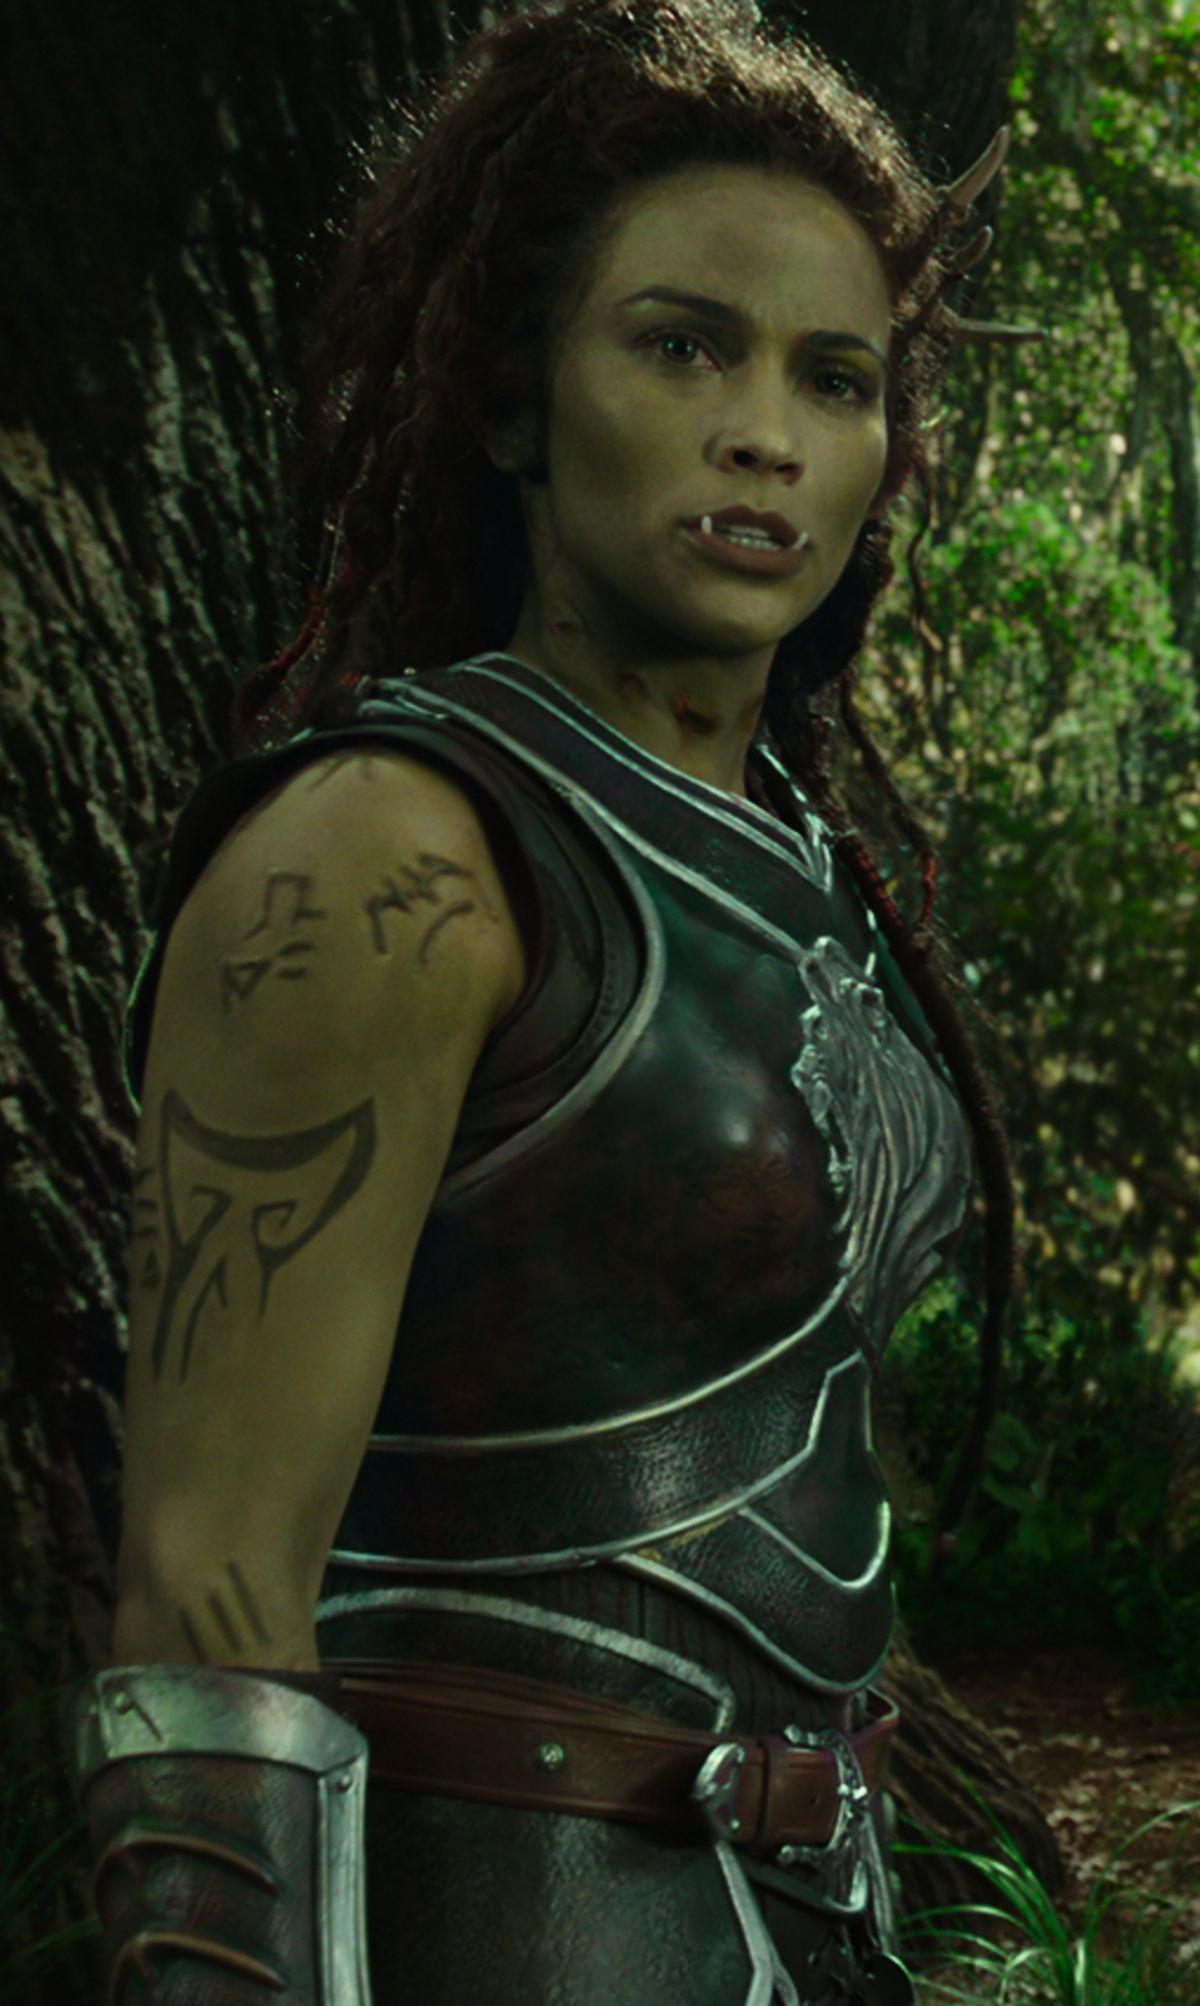 Garona Halforcen Film Universe Wowpedia Your Wiki Guide To The World Of Warcraft